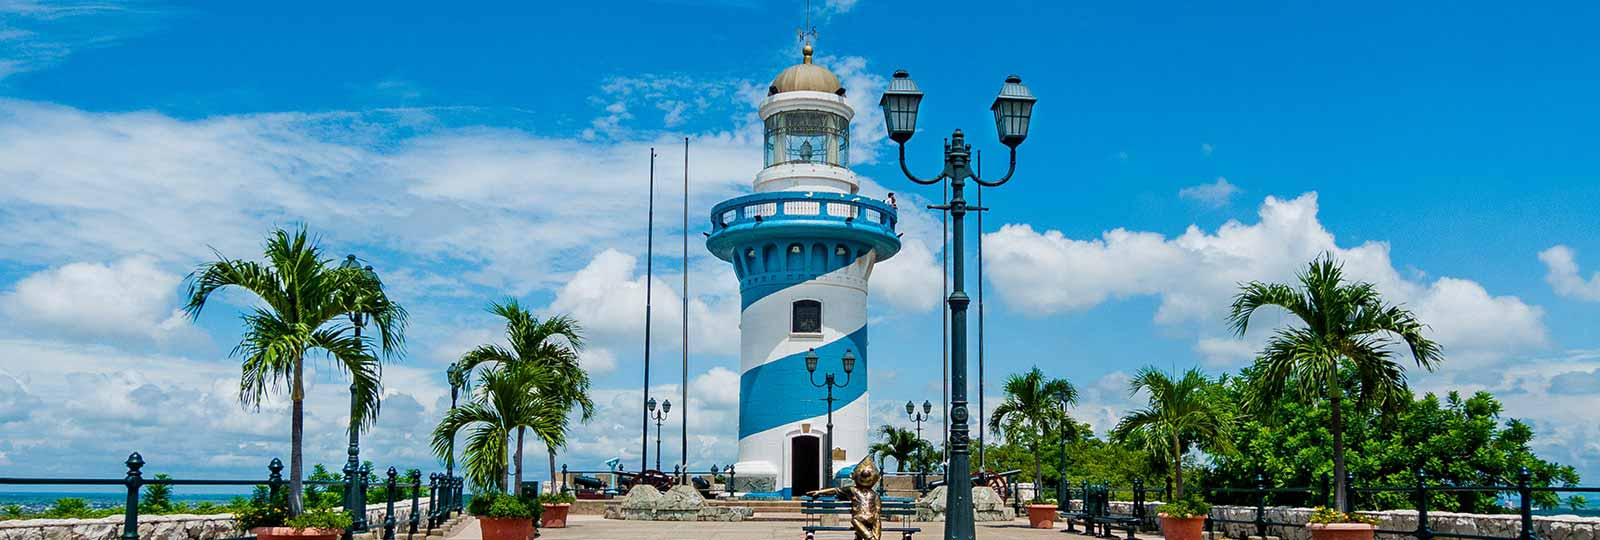 Faro de Guayaquil, Ecuador.